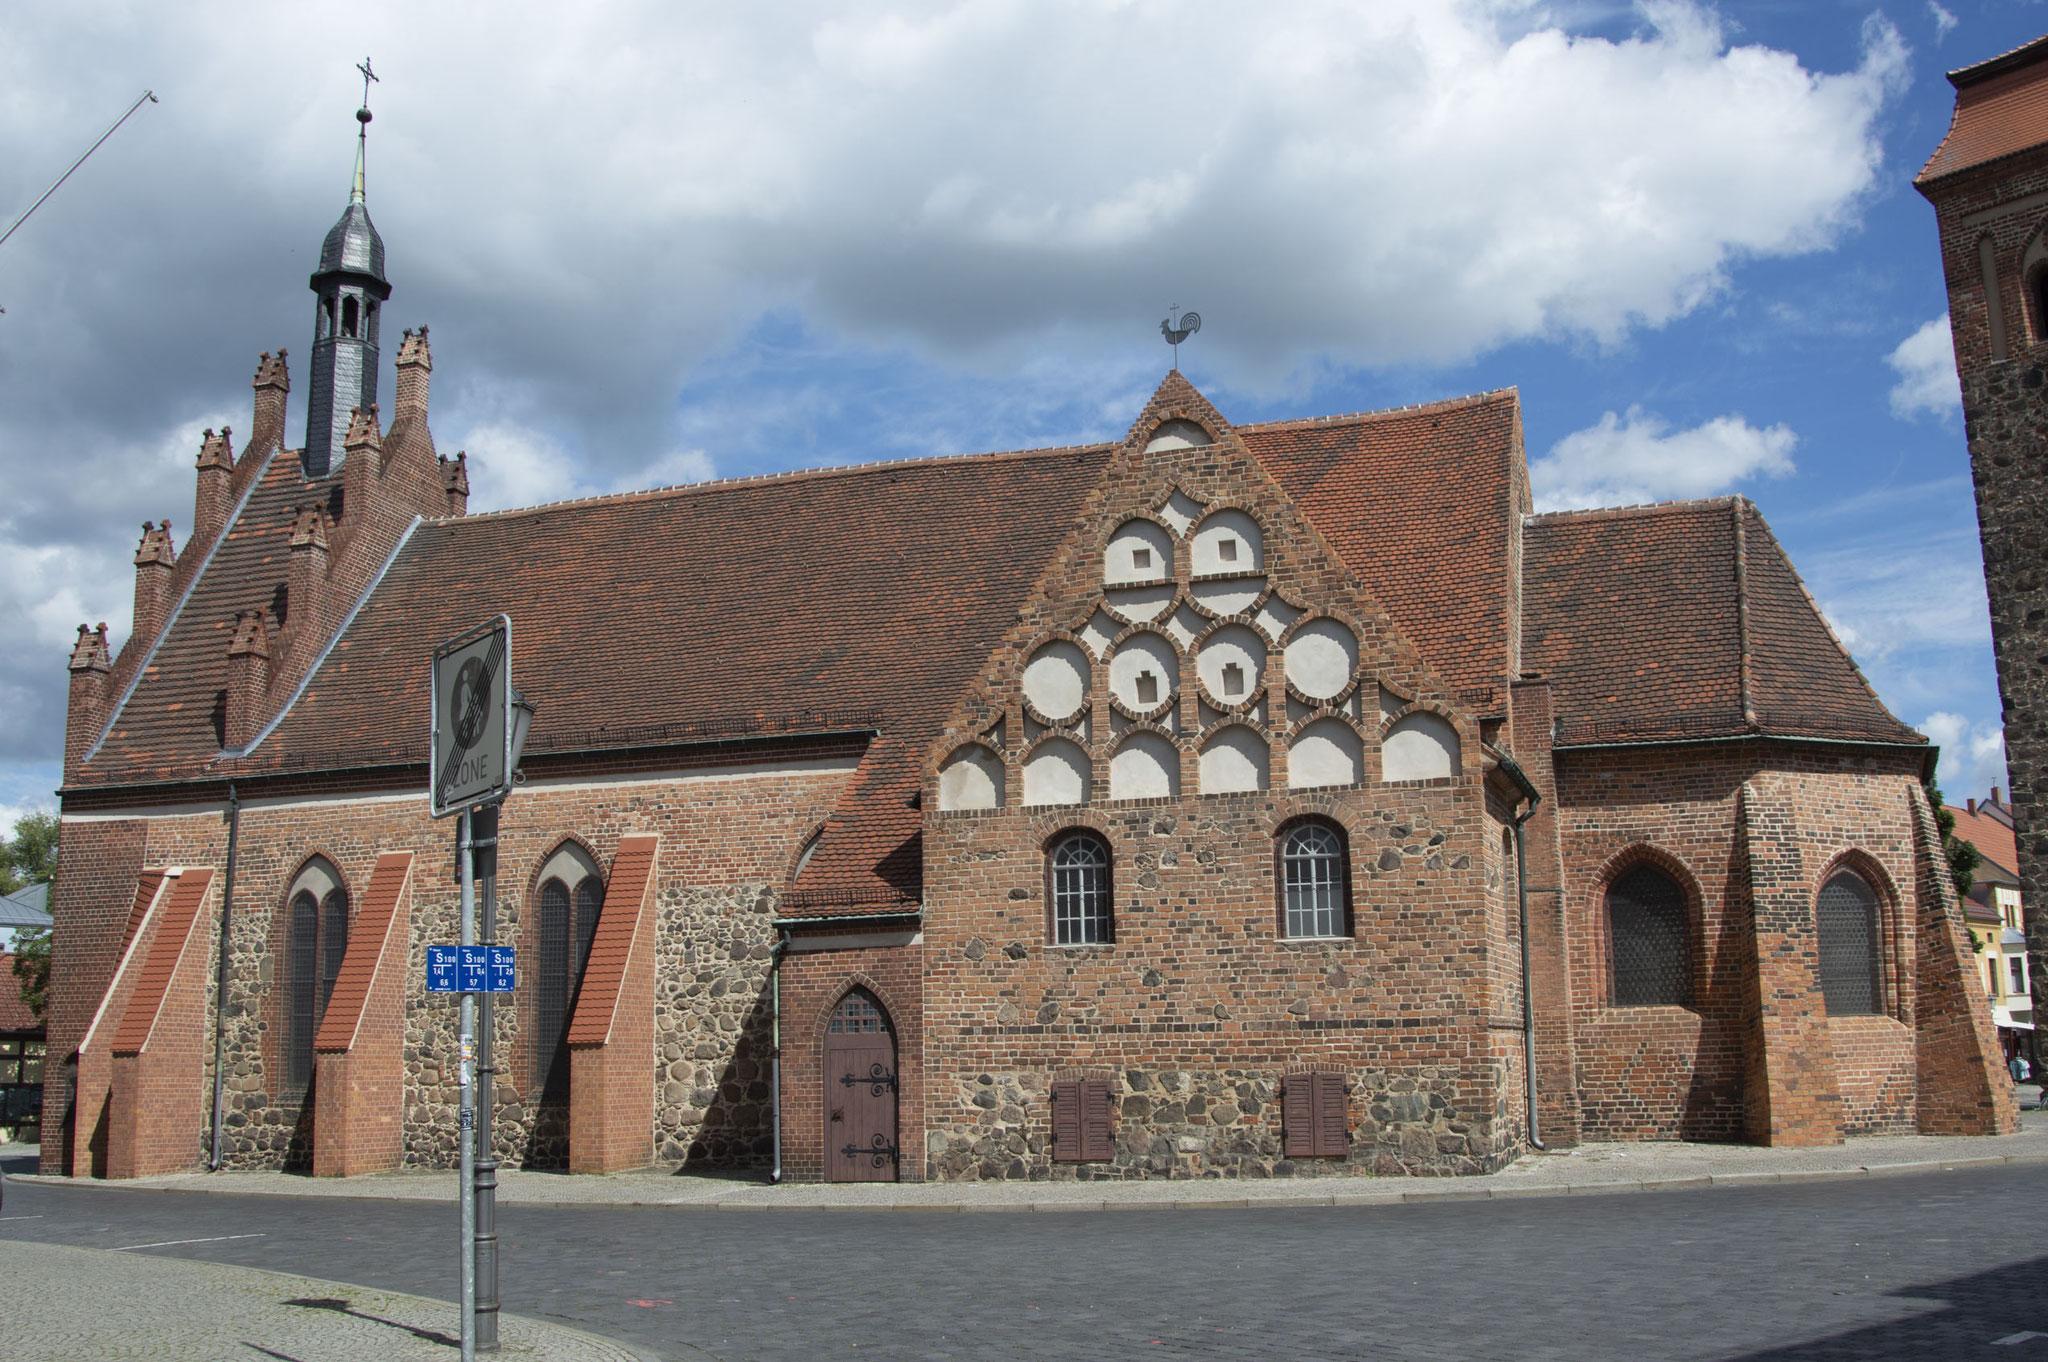 St. Johannis Kirche, Luckenwalde